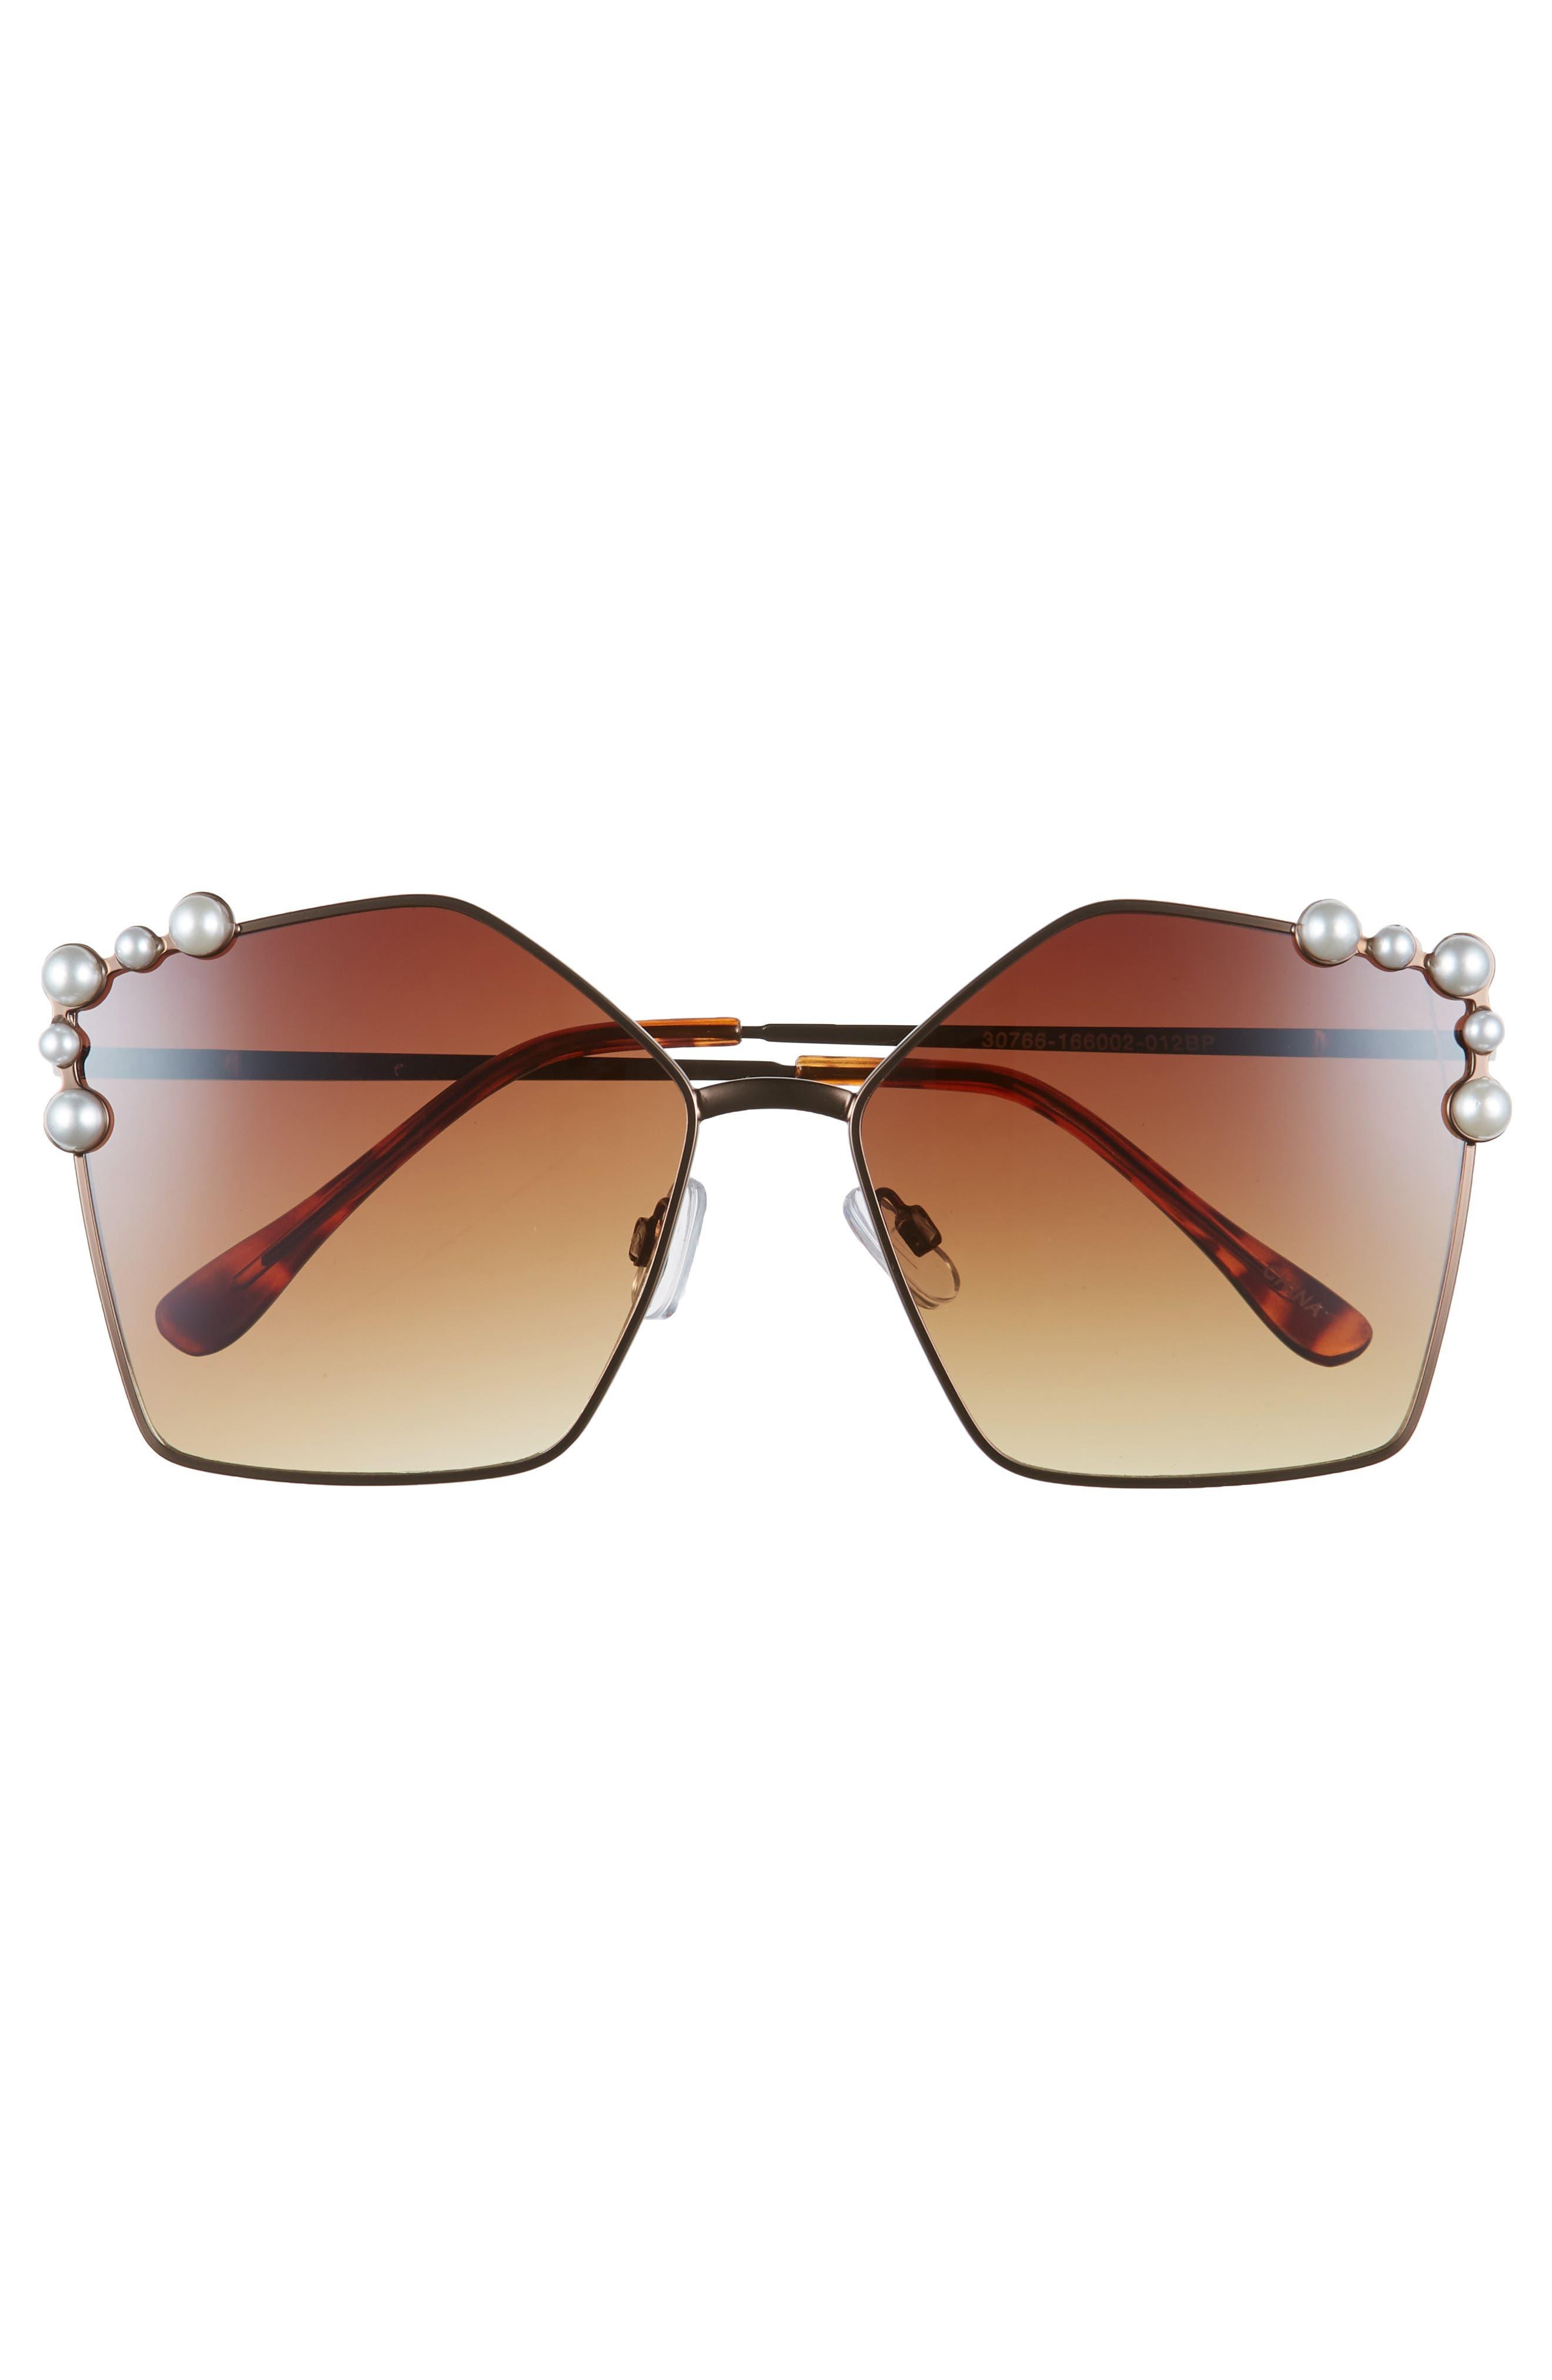 60mm Imitation Pearl Geometric Sunglasses,                             Alternate thumbnail 3, color,                             Brown/ Brown